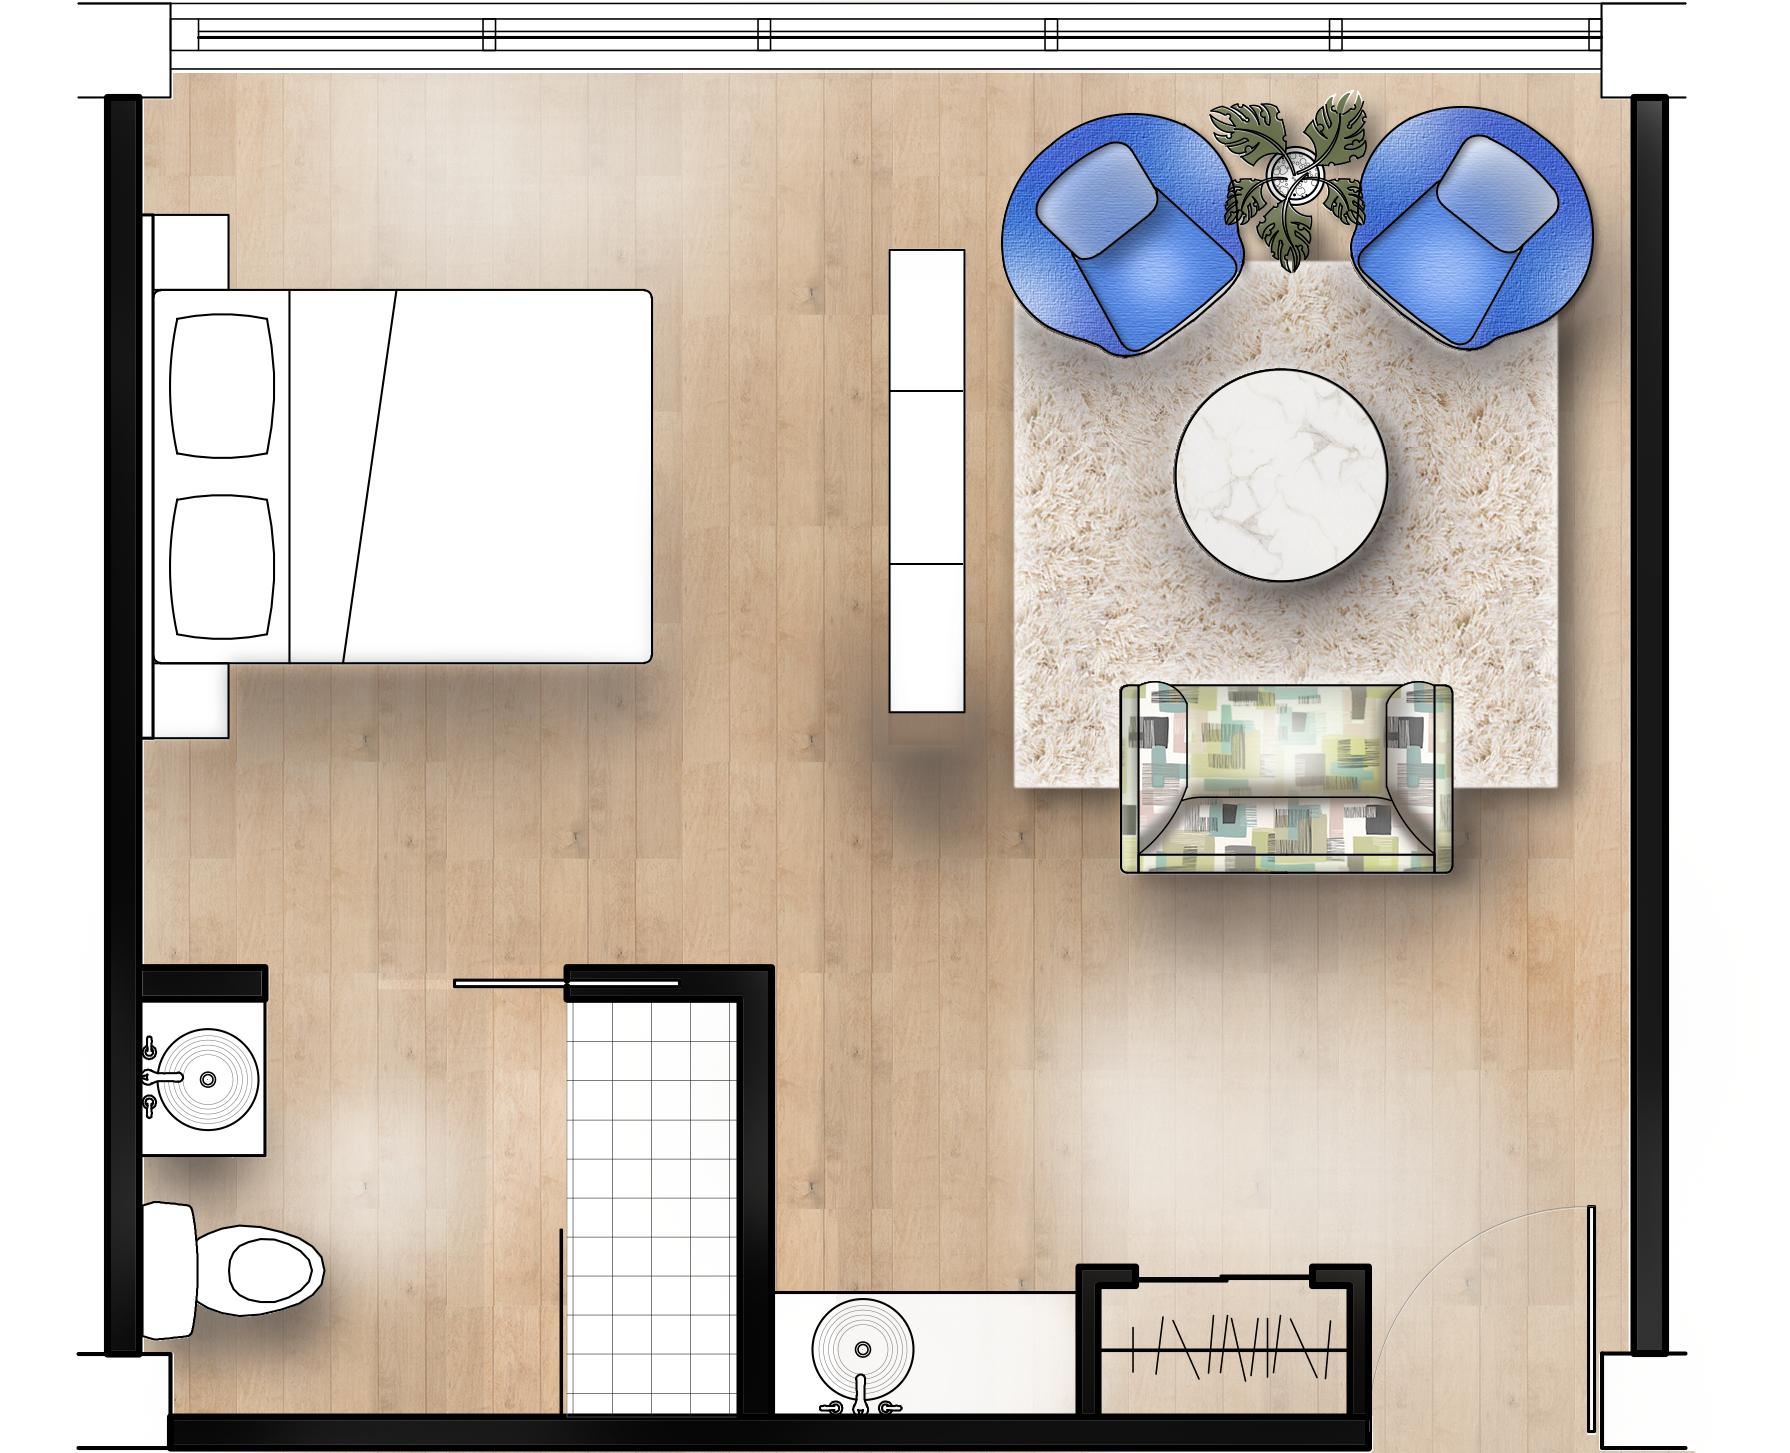 Floor Plan Rendering Of Birthing Suite Healthcare Interior Design Rendered Floor Plan Hospital Design